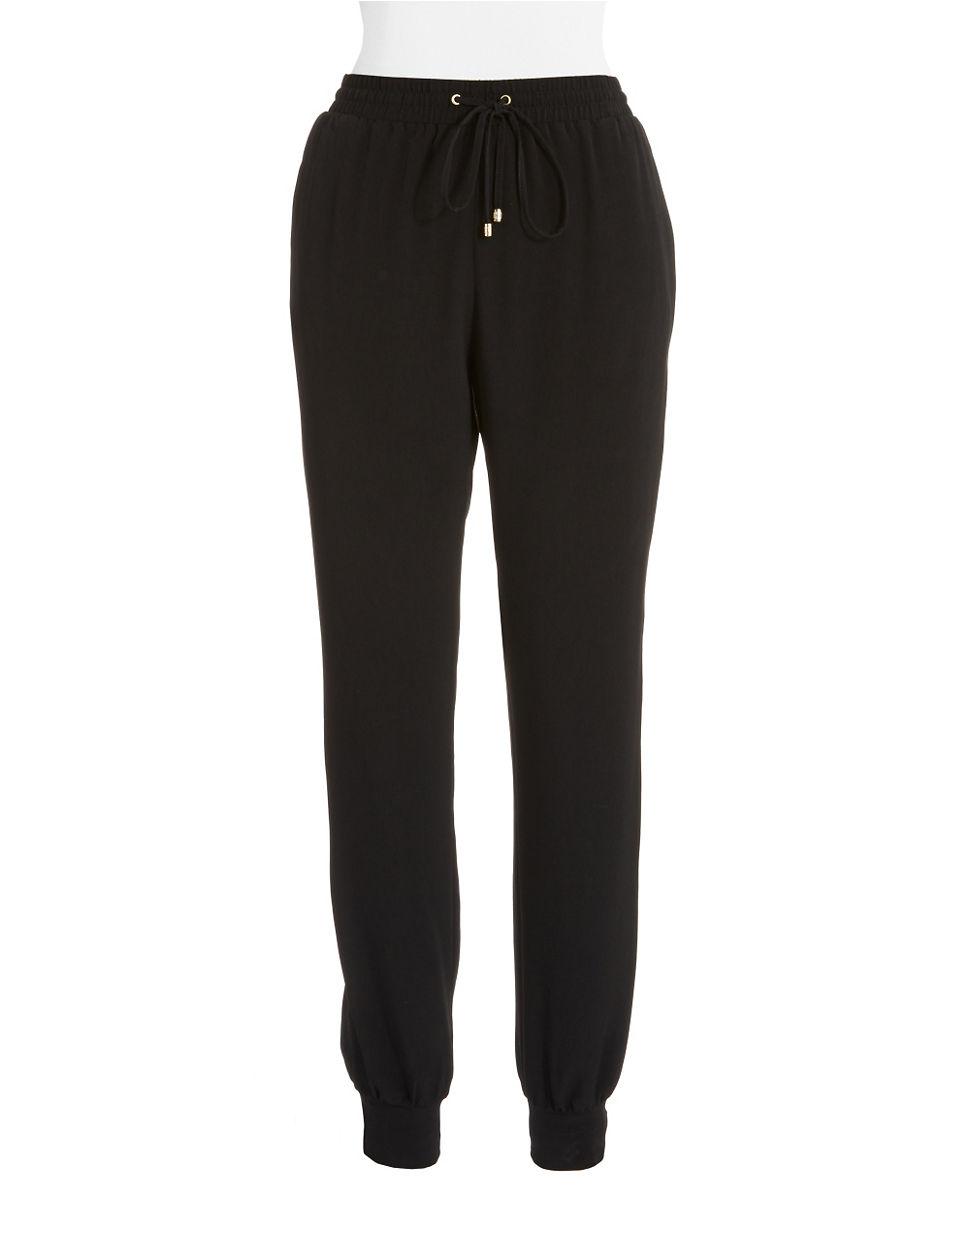 womens clothing pantsuits ivanka trump